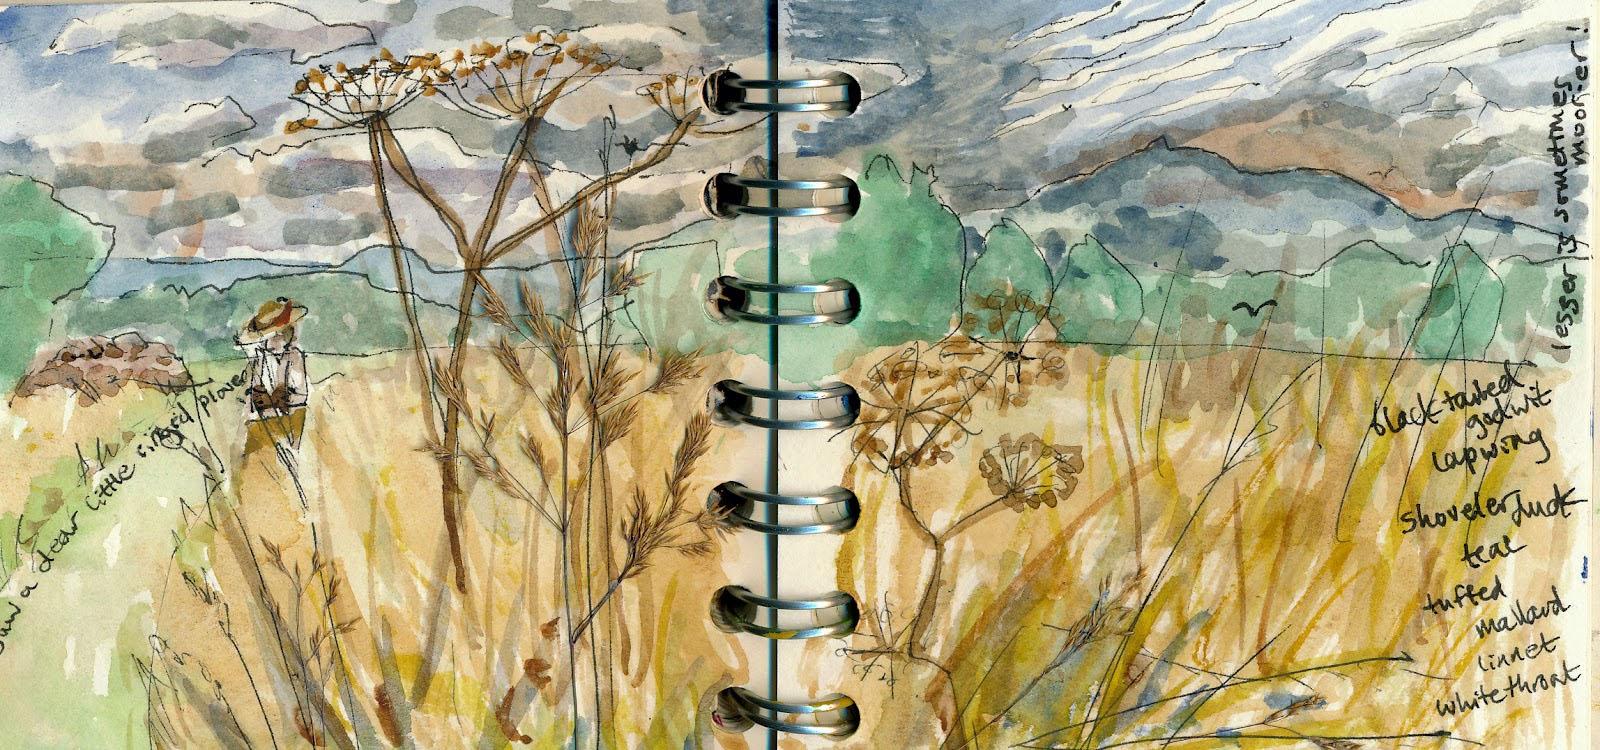 Jupiter Virgo Libra Chiron Uranus Notebook Art Landscape